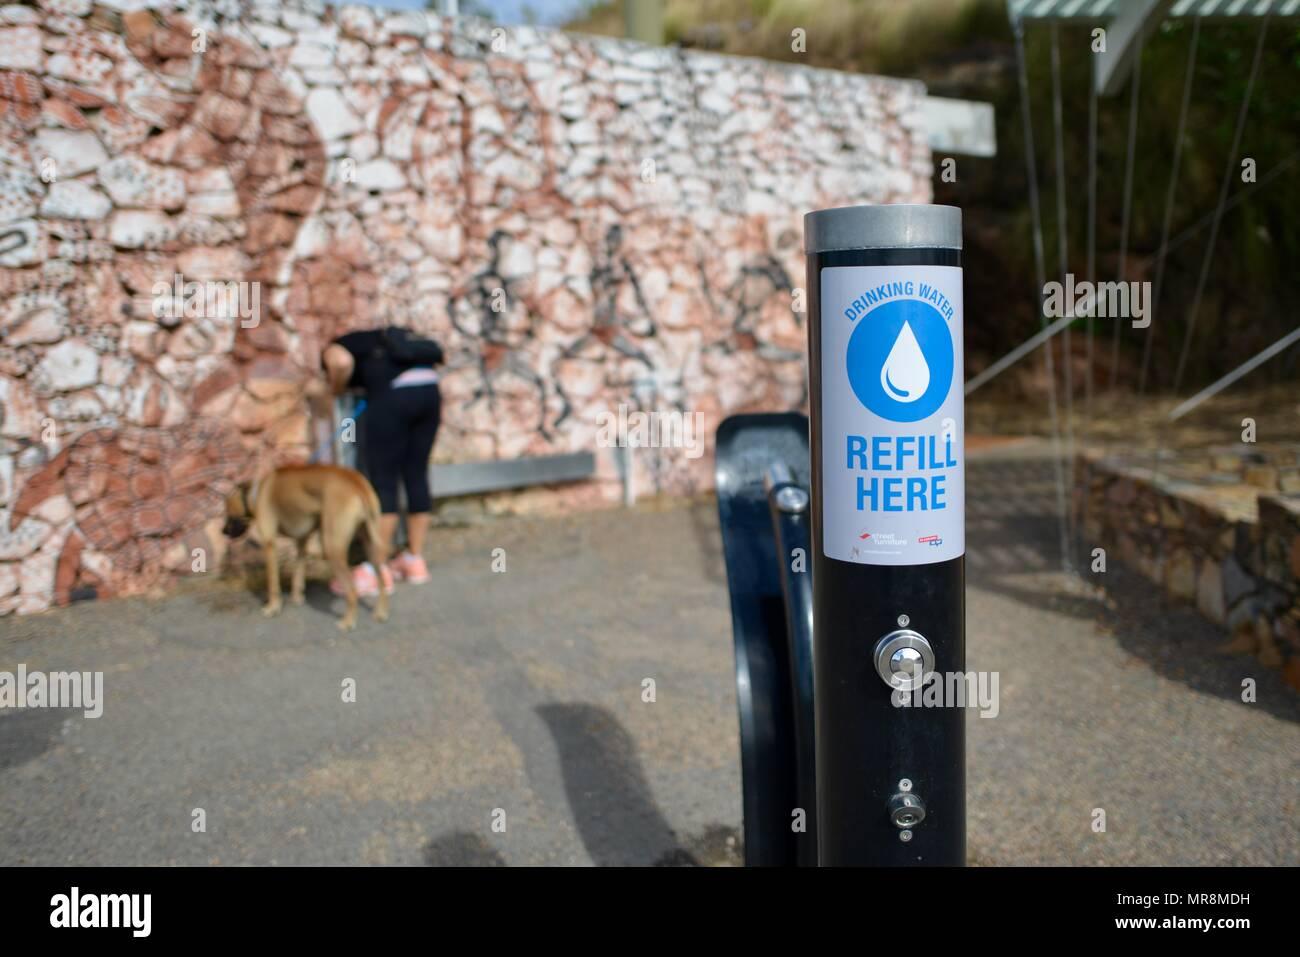 Refill here water tap dispenser, Castle Hill QLD 4810, Australia - Stock Image